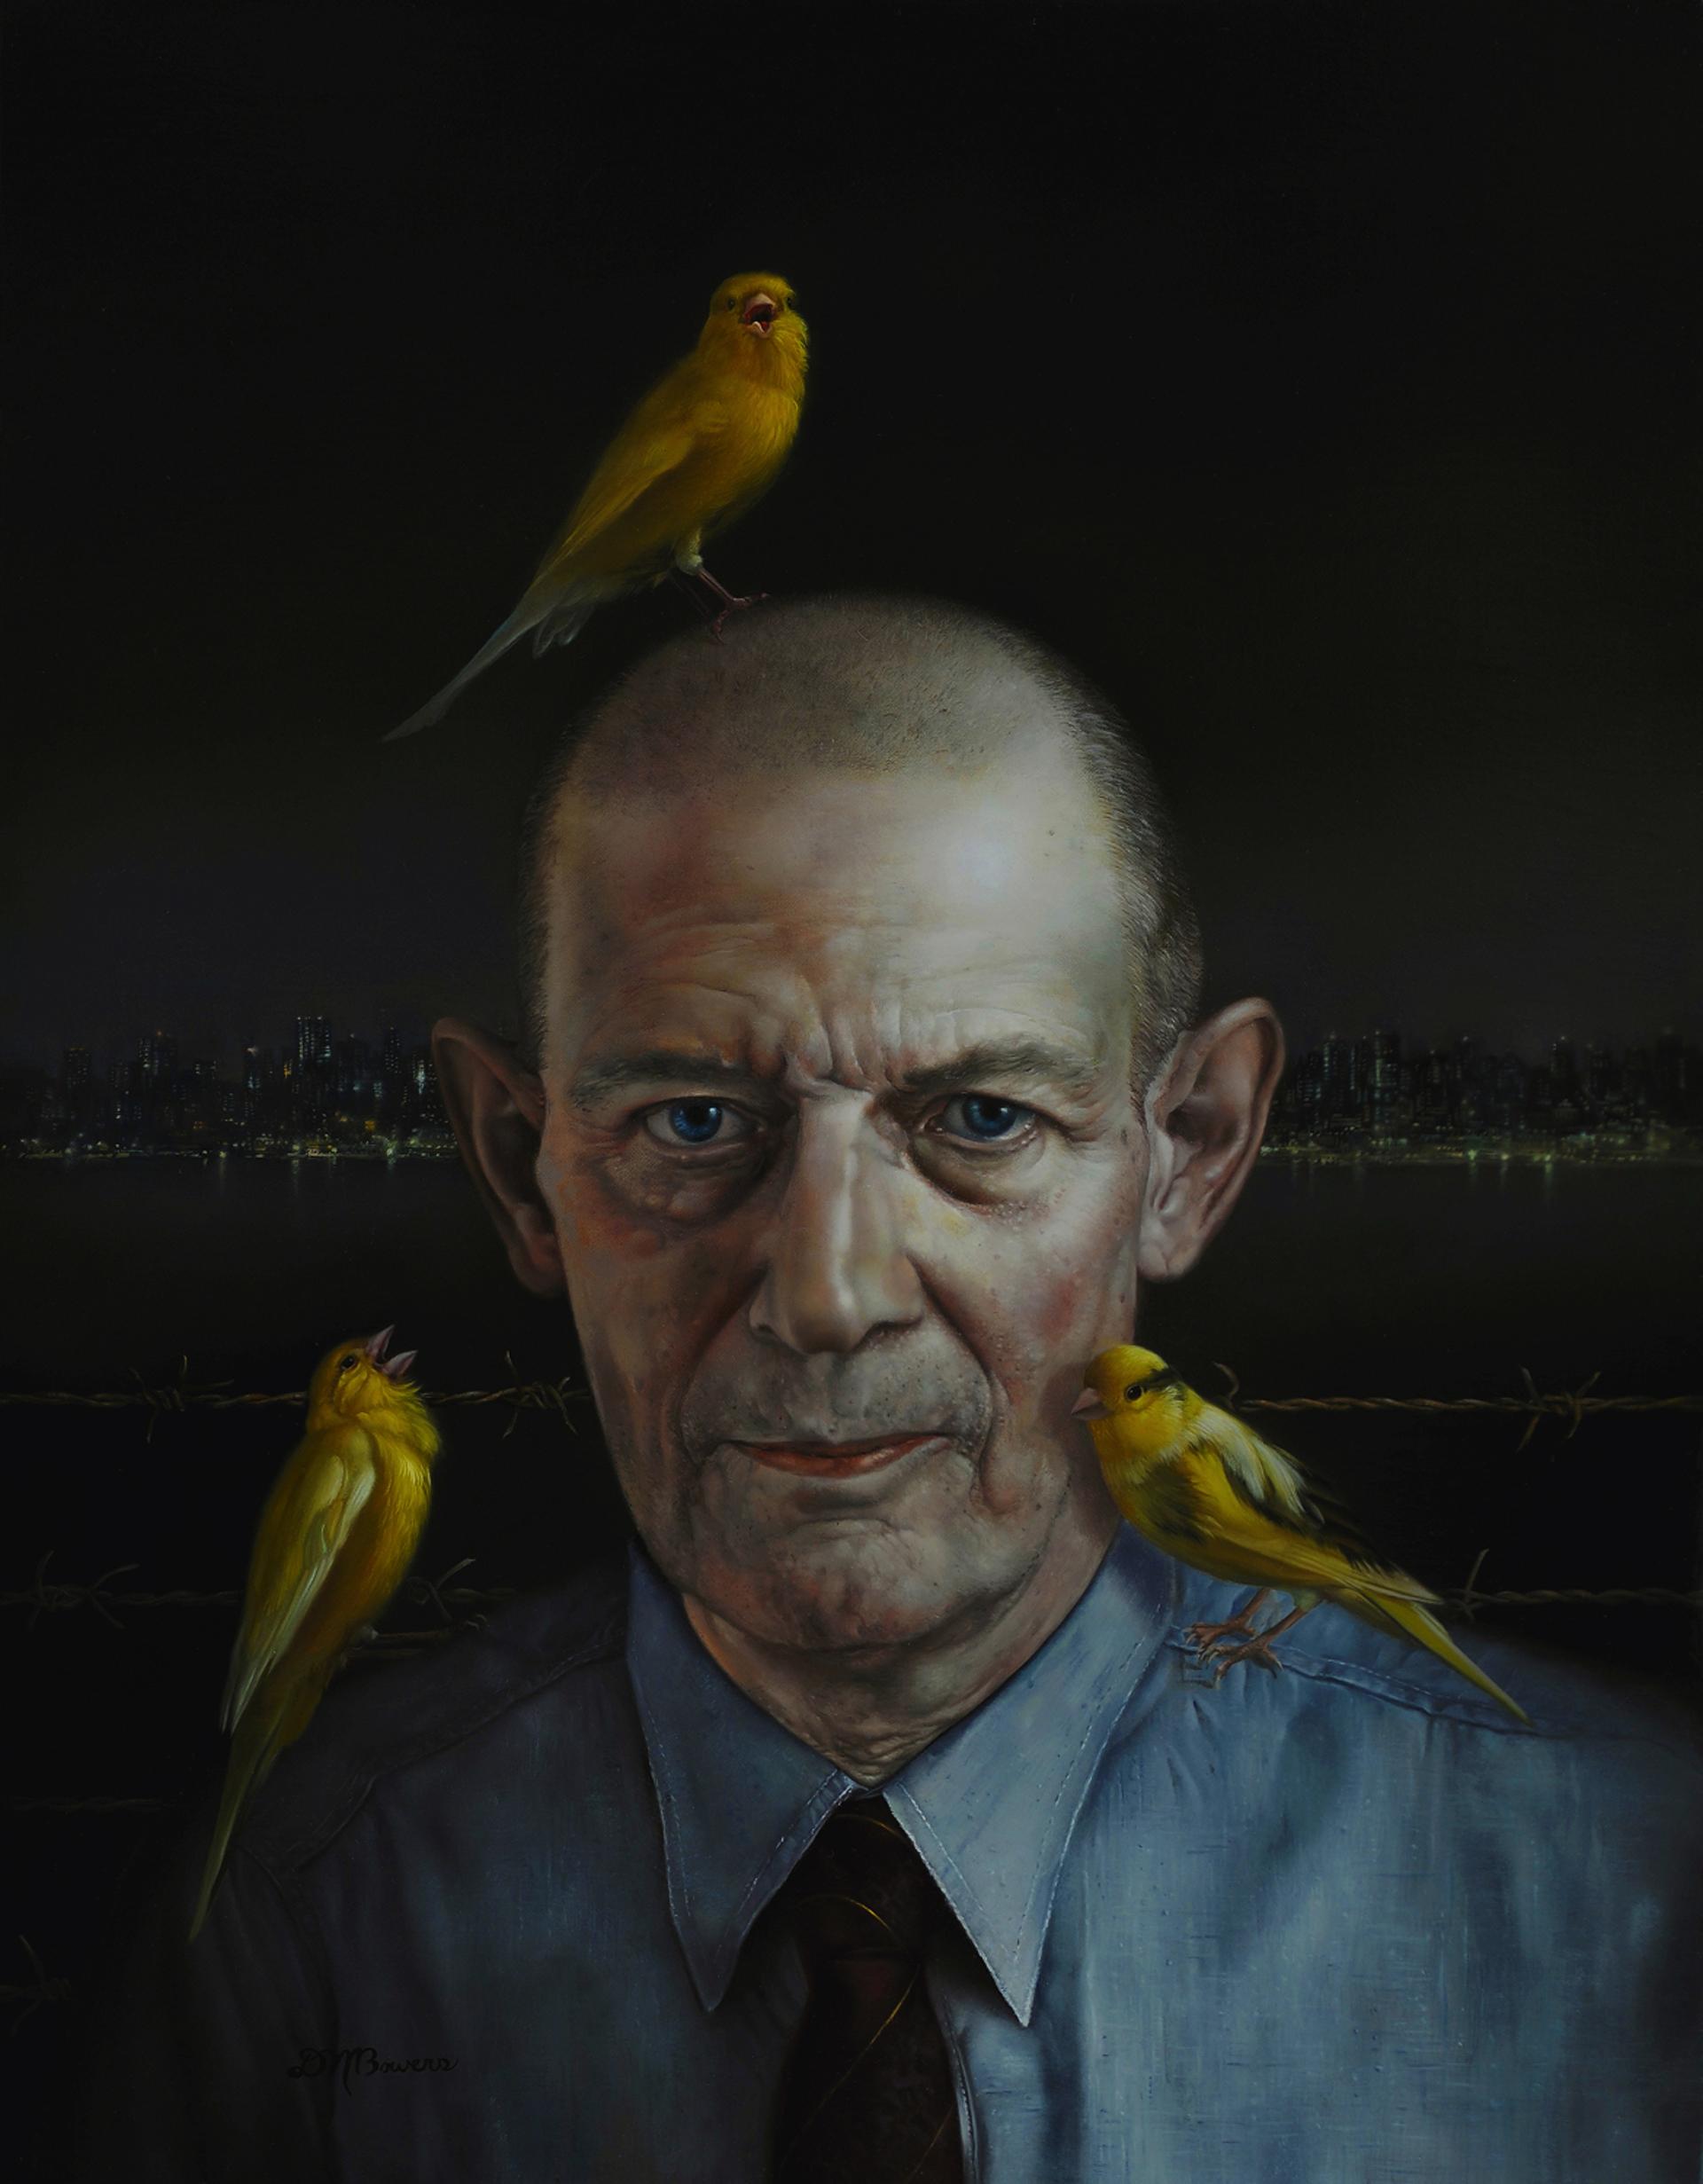 Robert Stroud (Birdman of Alcatraz) by David Michael Bowers